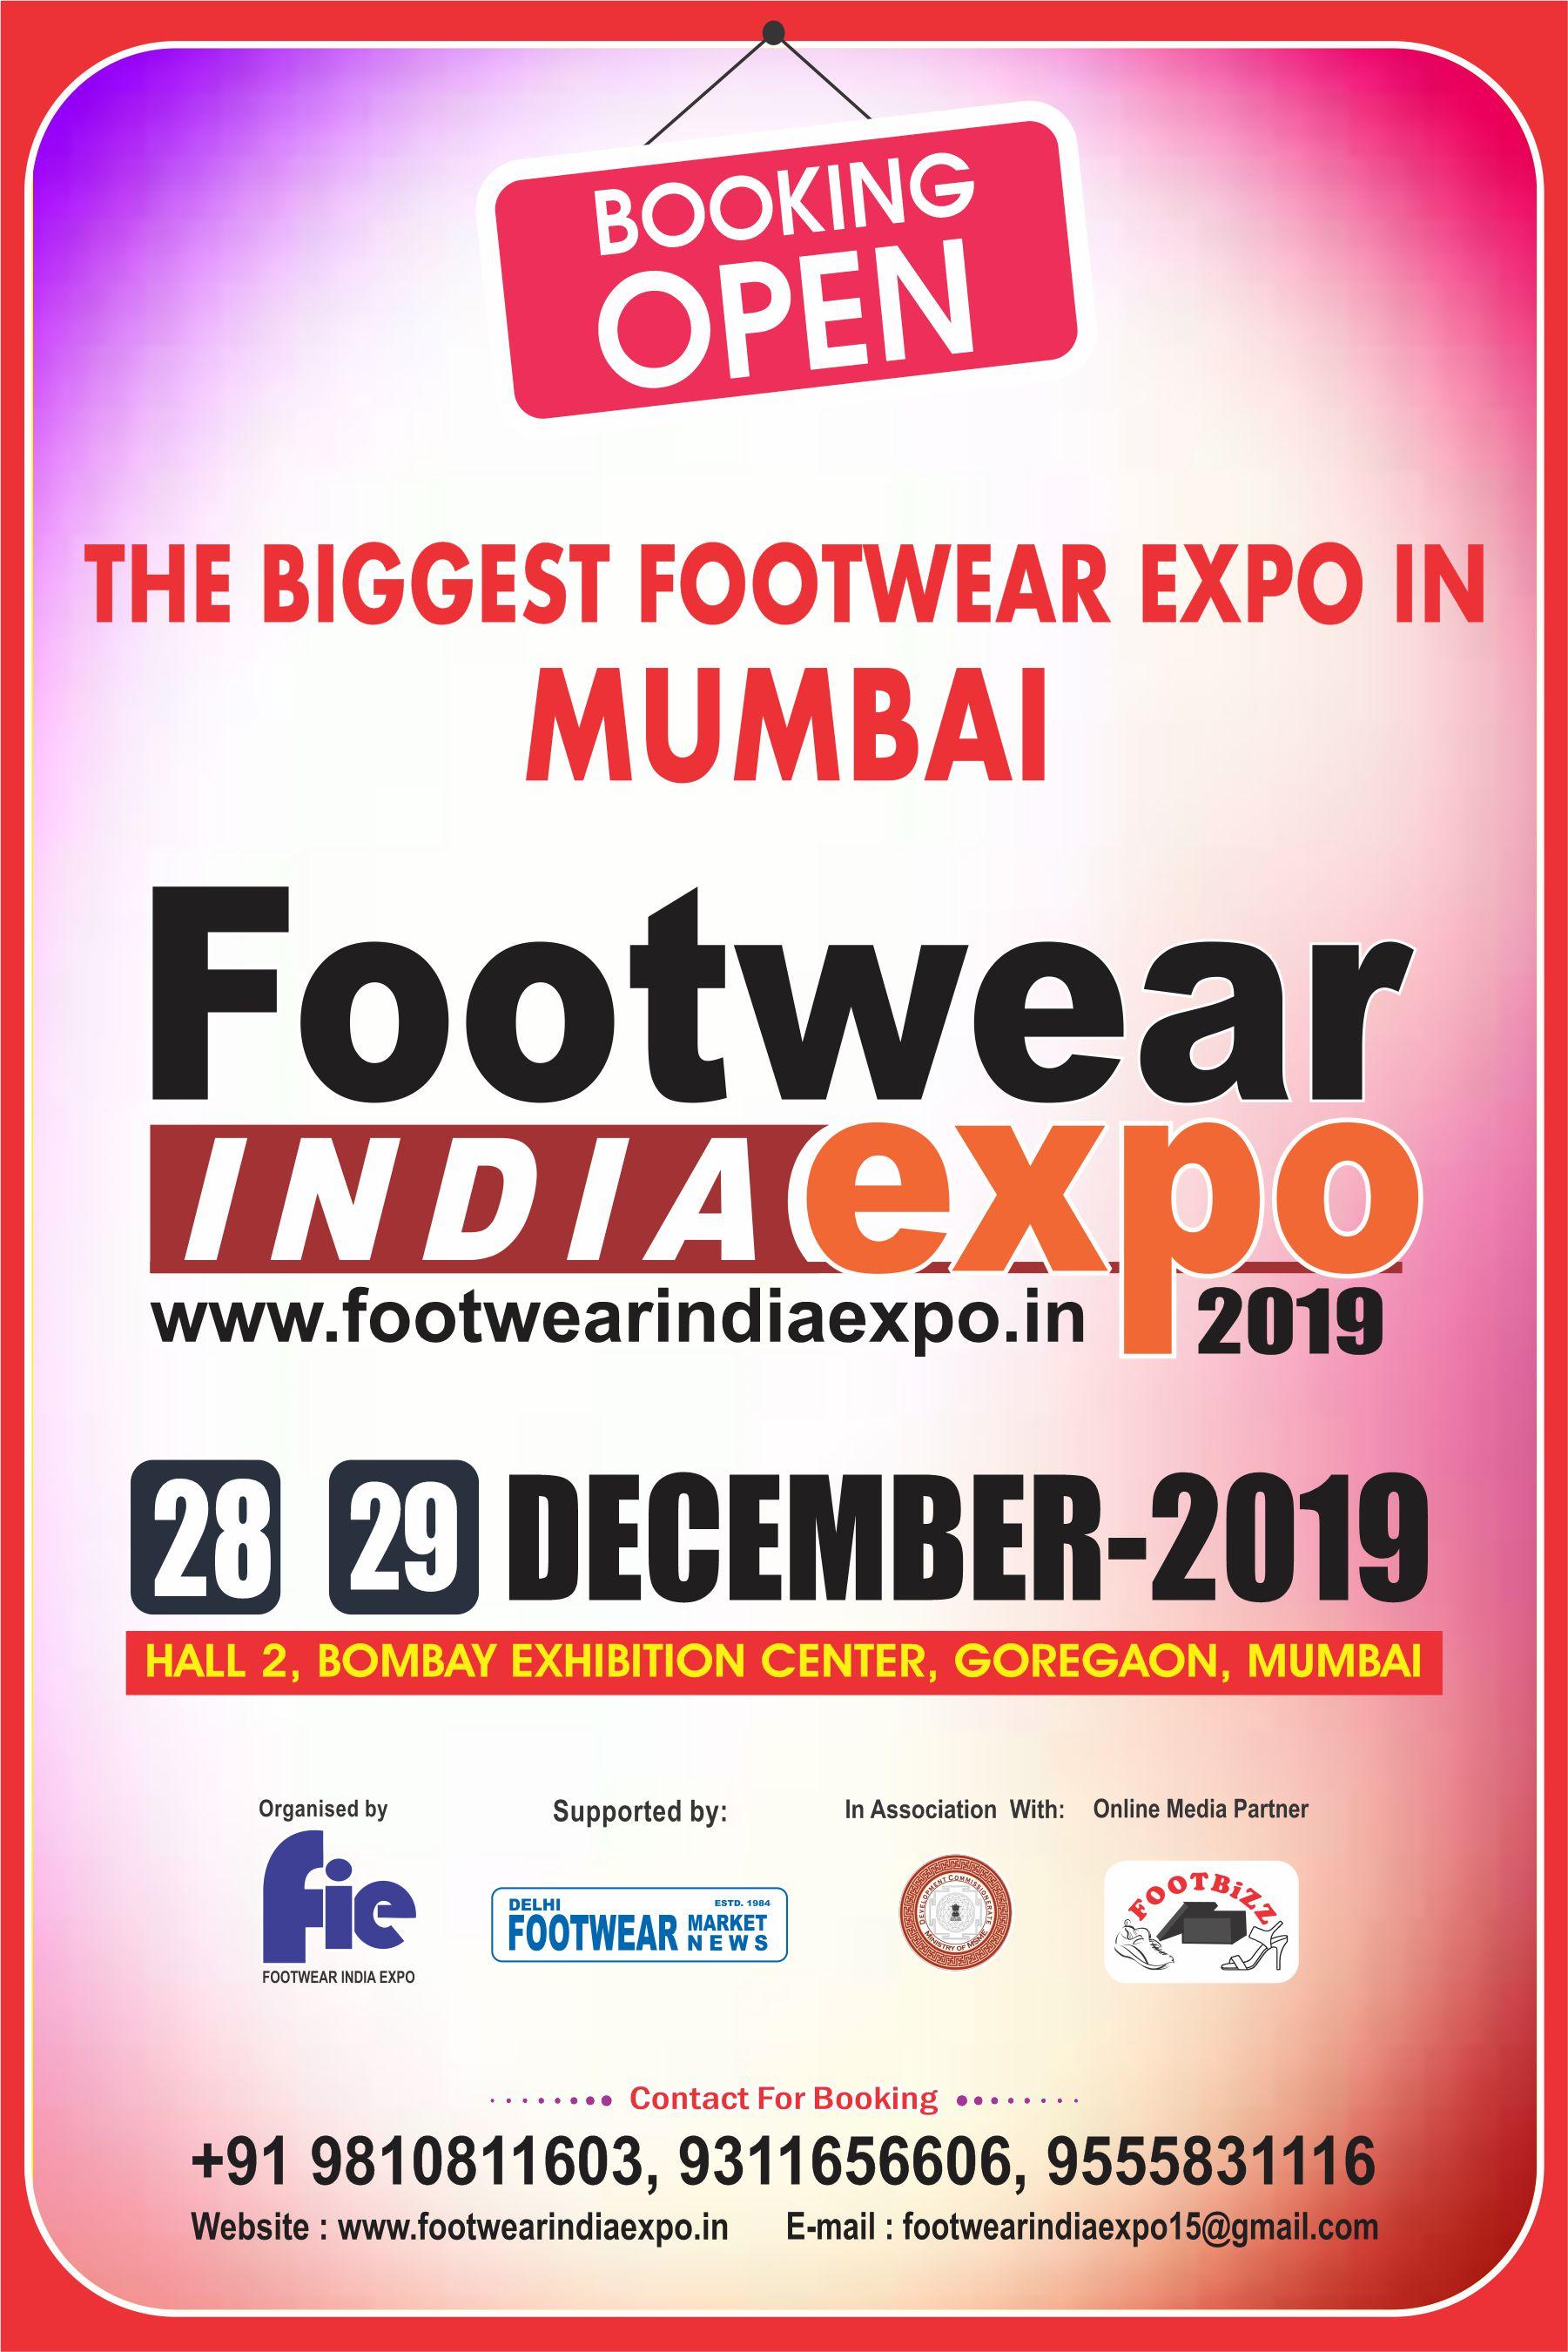 Footwear India Expo, footwear expo delhi,Footwear India Expo